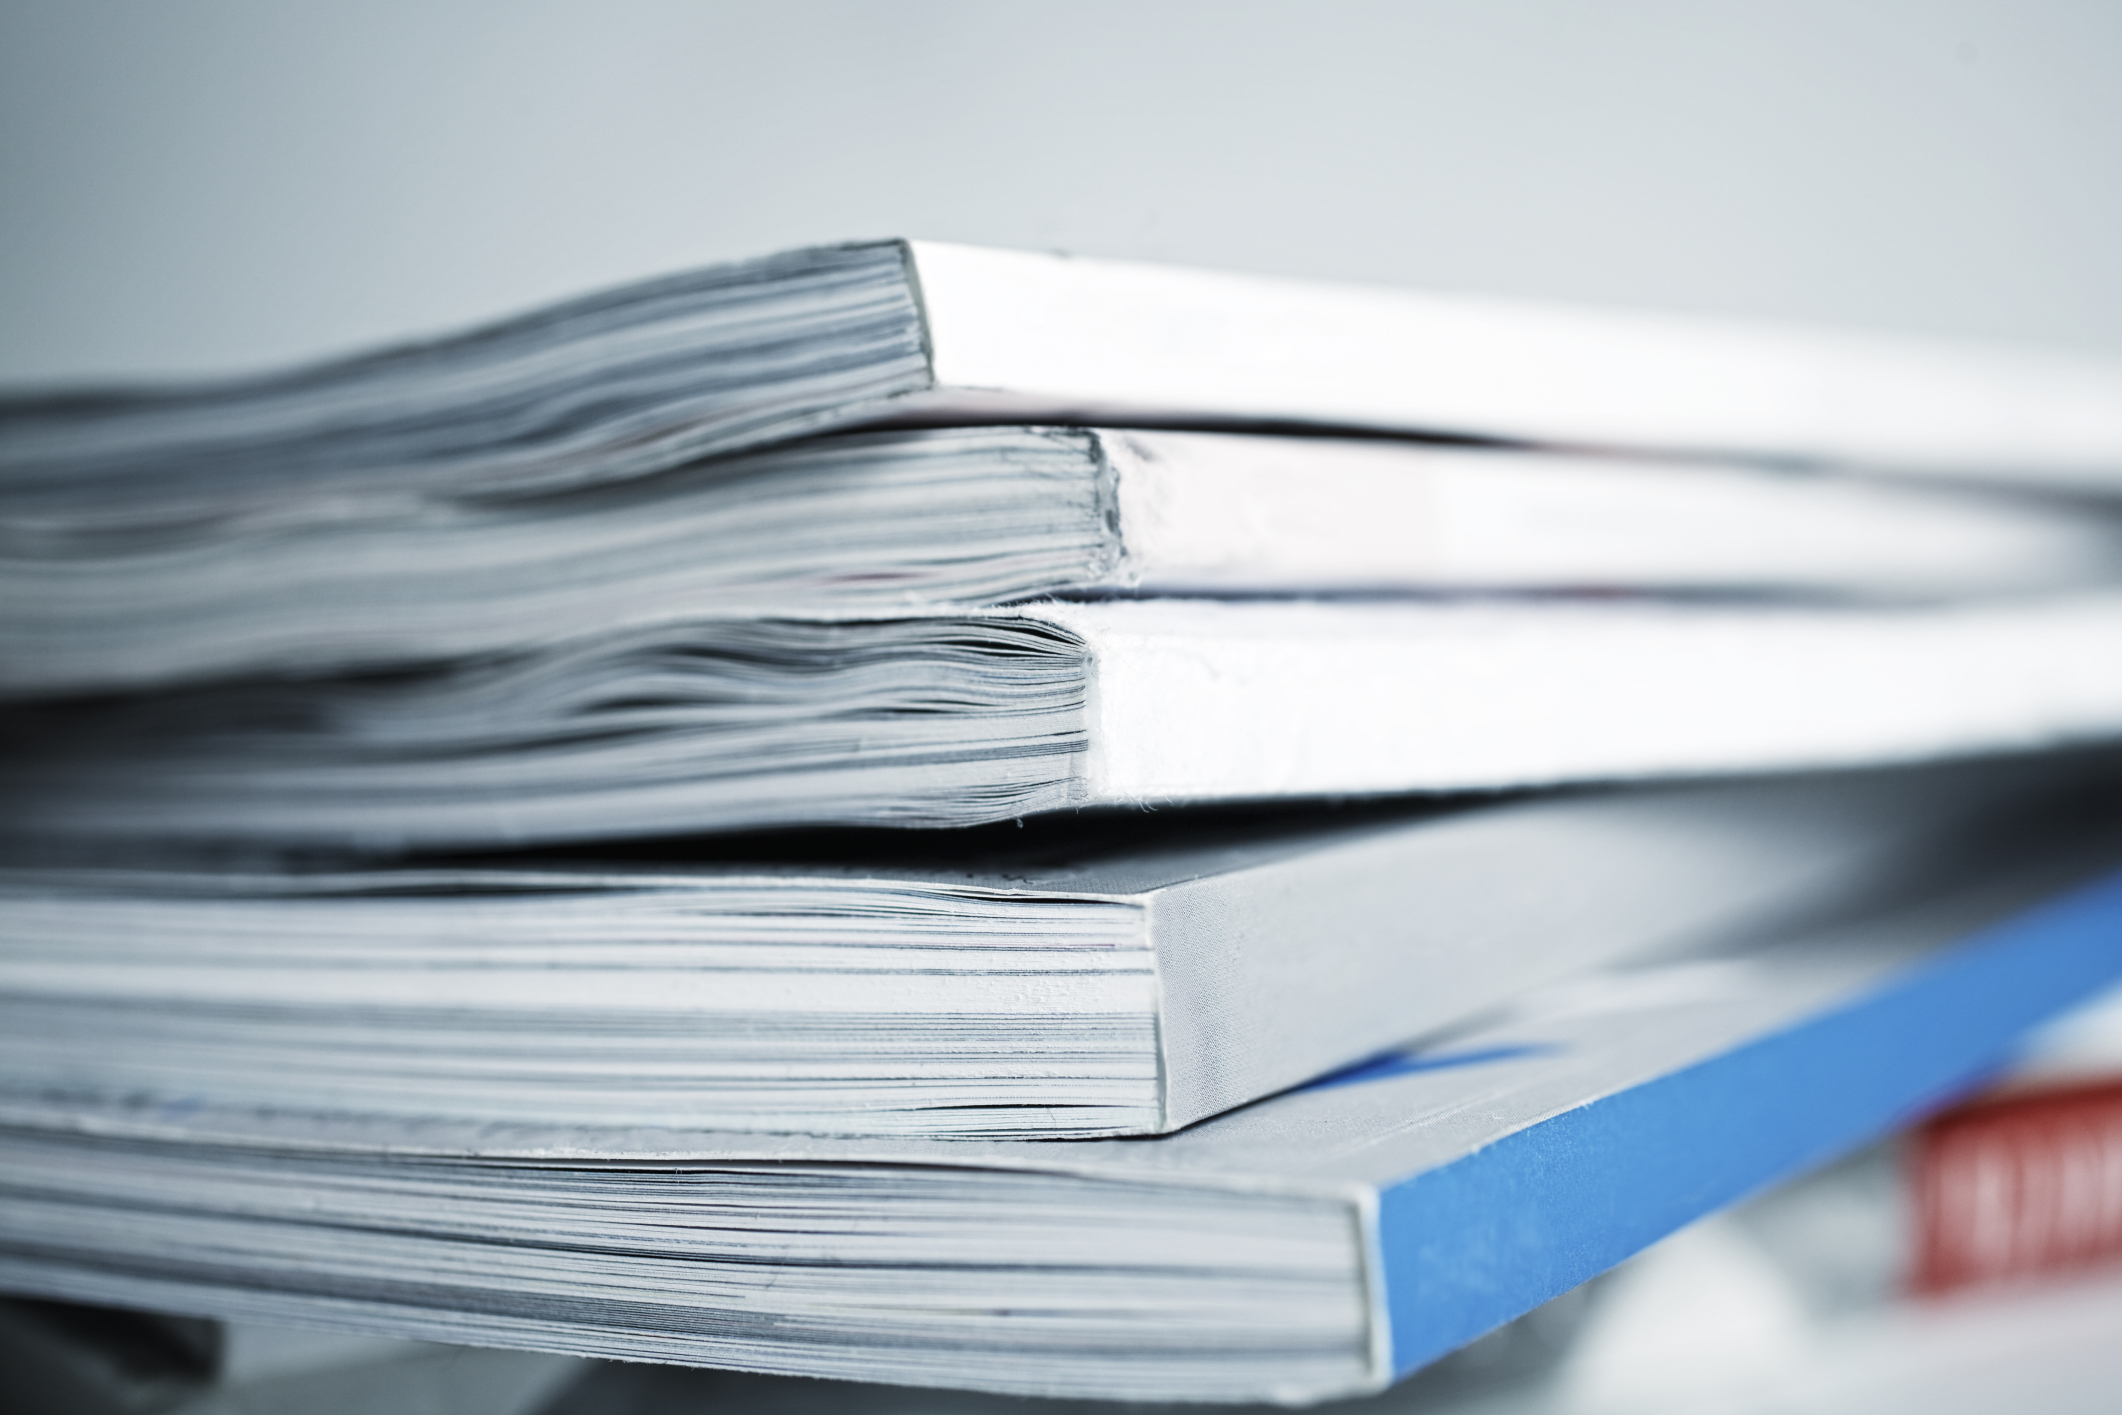 Flipboard Magazines Arrive On The Web